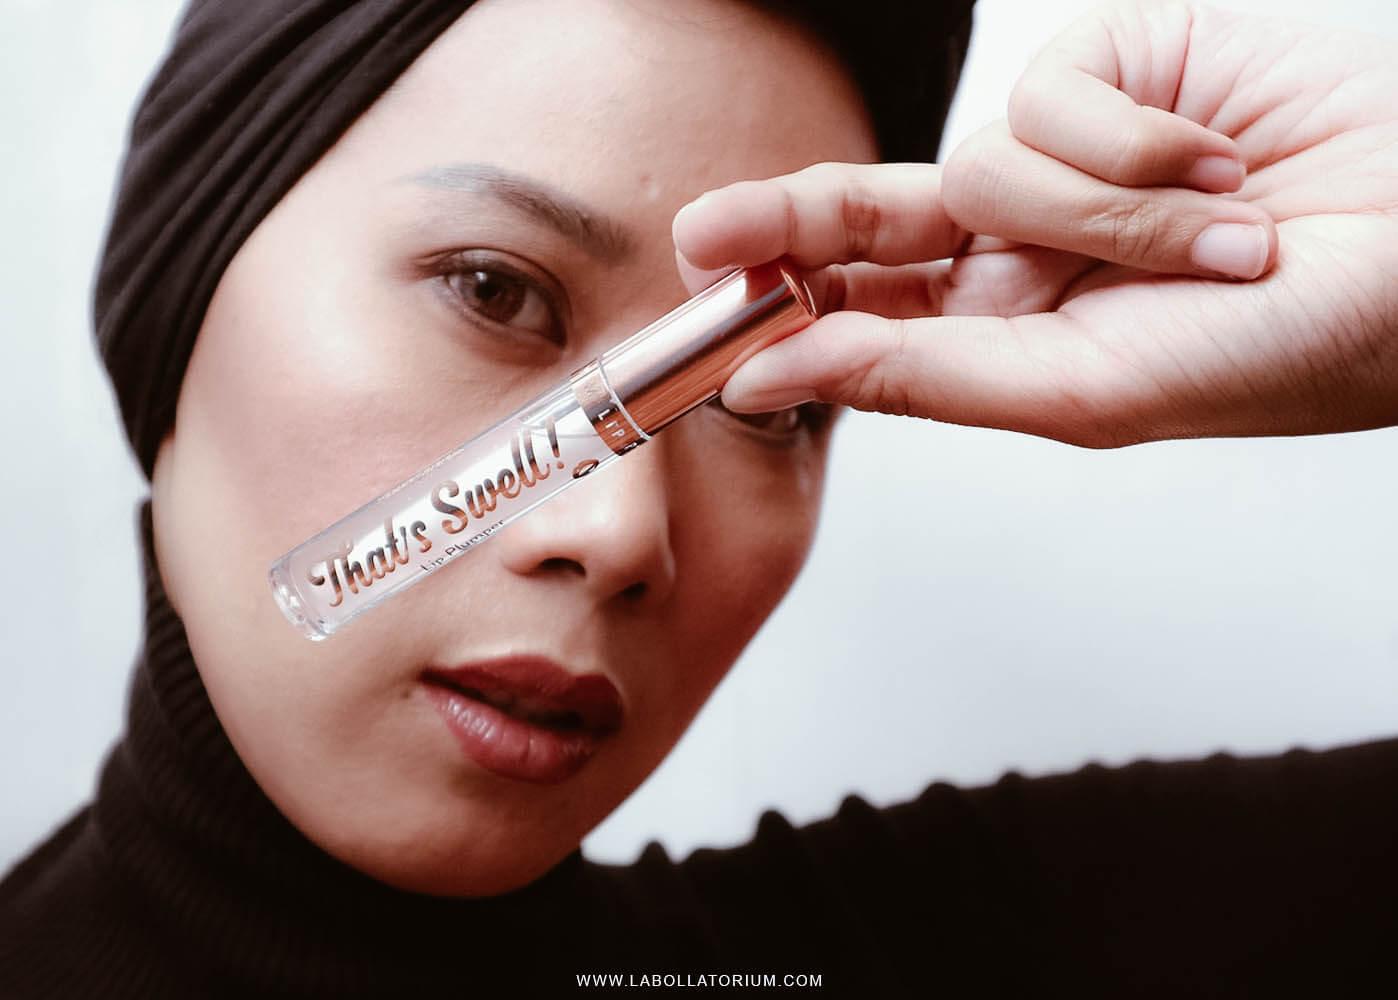 Barry M That's Swell! Lip Plumper, The Best Clear Lip Gloss! - Hijab Woman